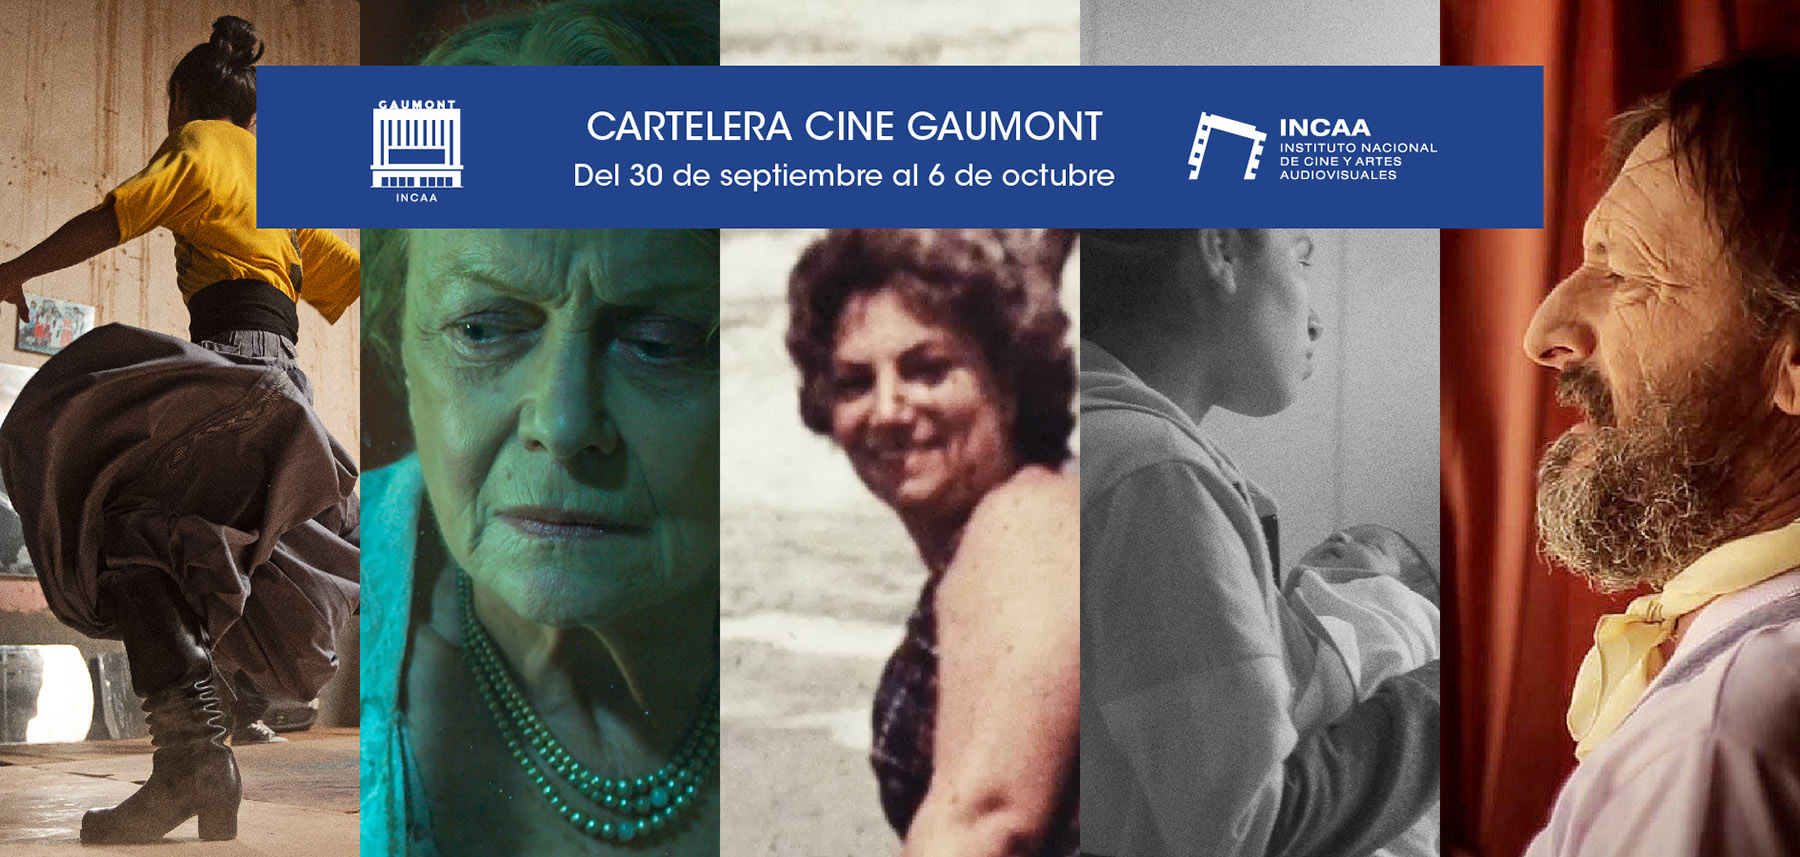 Cartelera Cine Gaumont